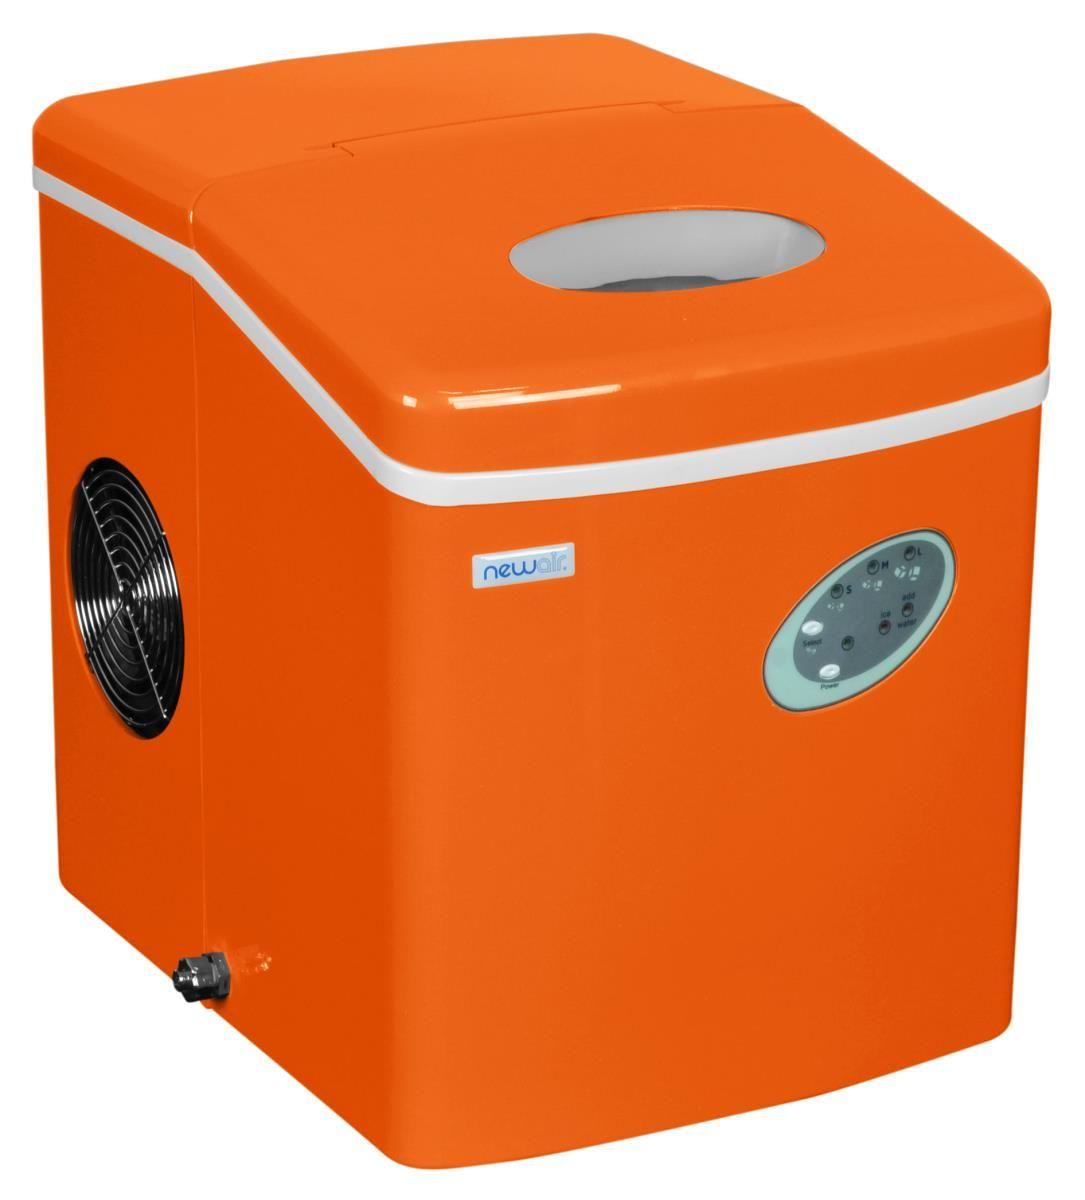 Newair Ai 100vo 28 Pound Portable Ice Maker In Orange Portable